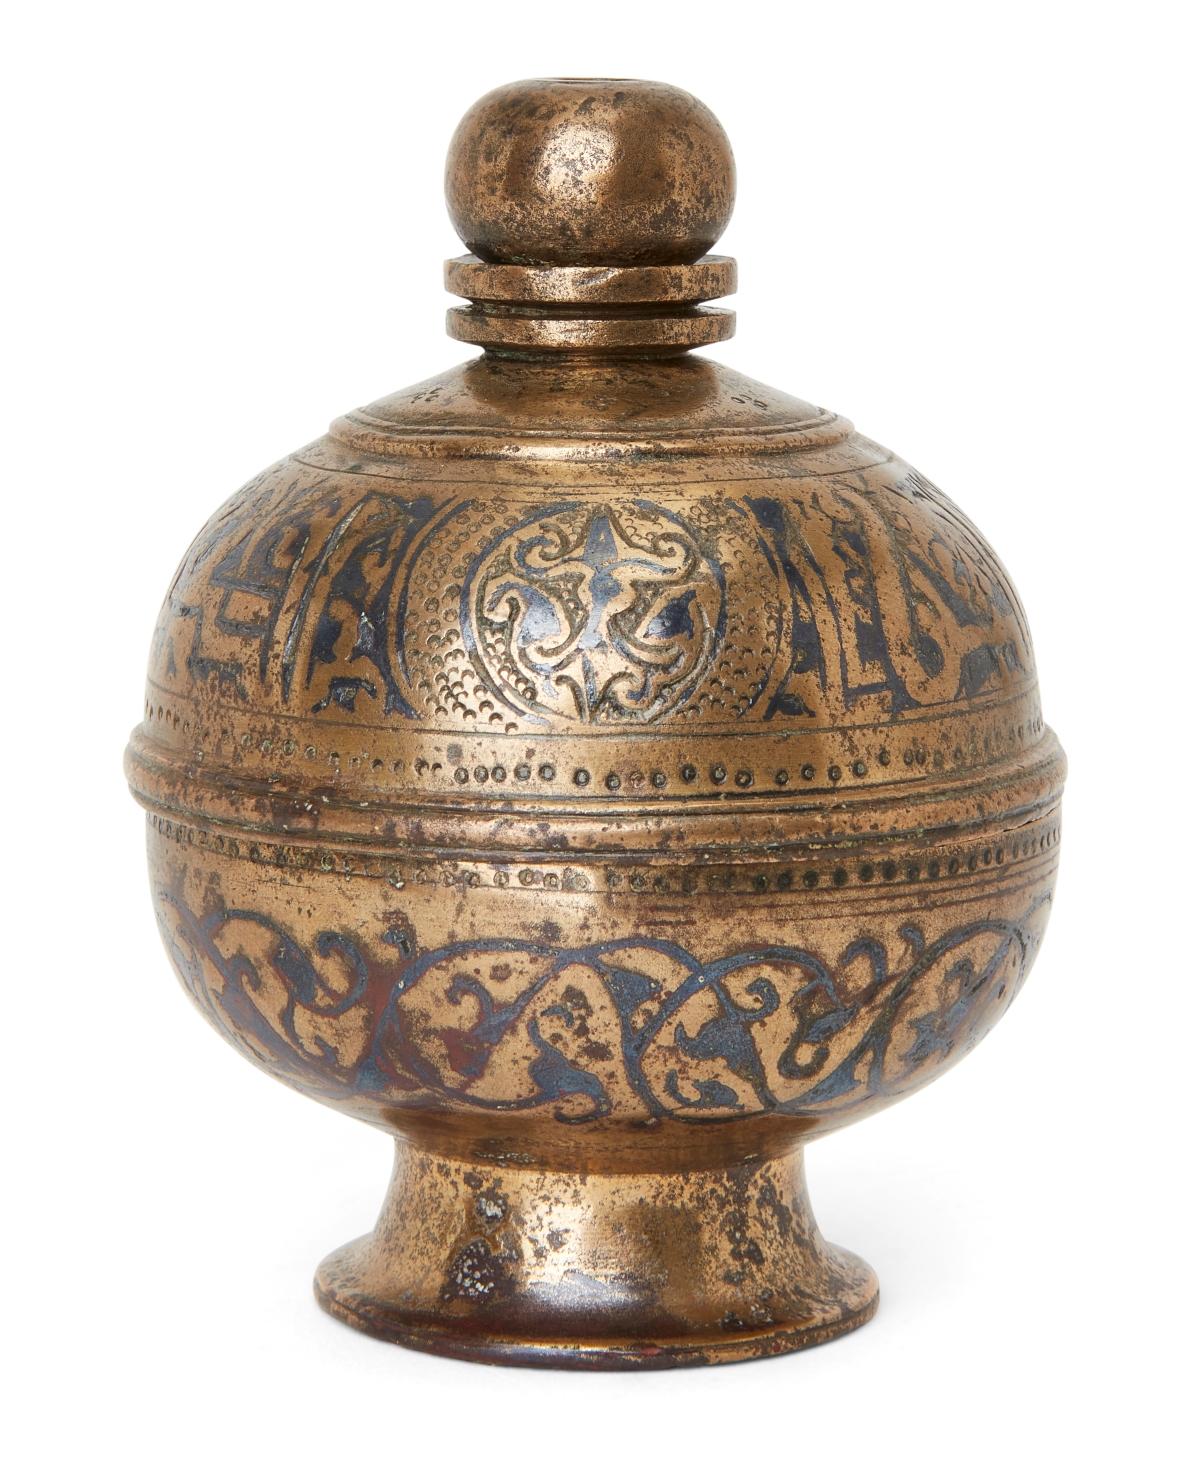 A niello decorated cast bronze incense burner finial, Khorasan, Iran, 11th-12th century